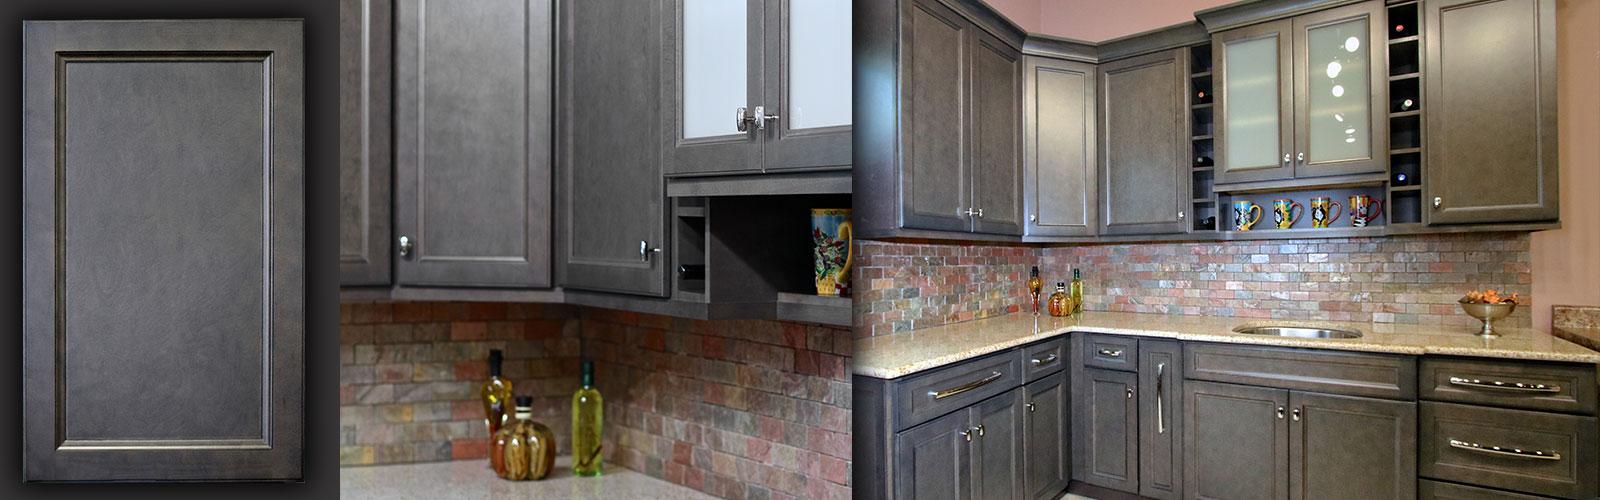 in stock kitchen cabinets reviews rug runner in-stock & bathroom vanity ...